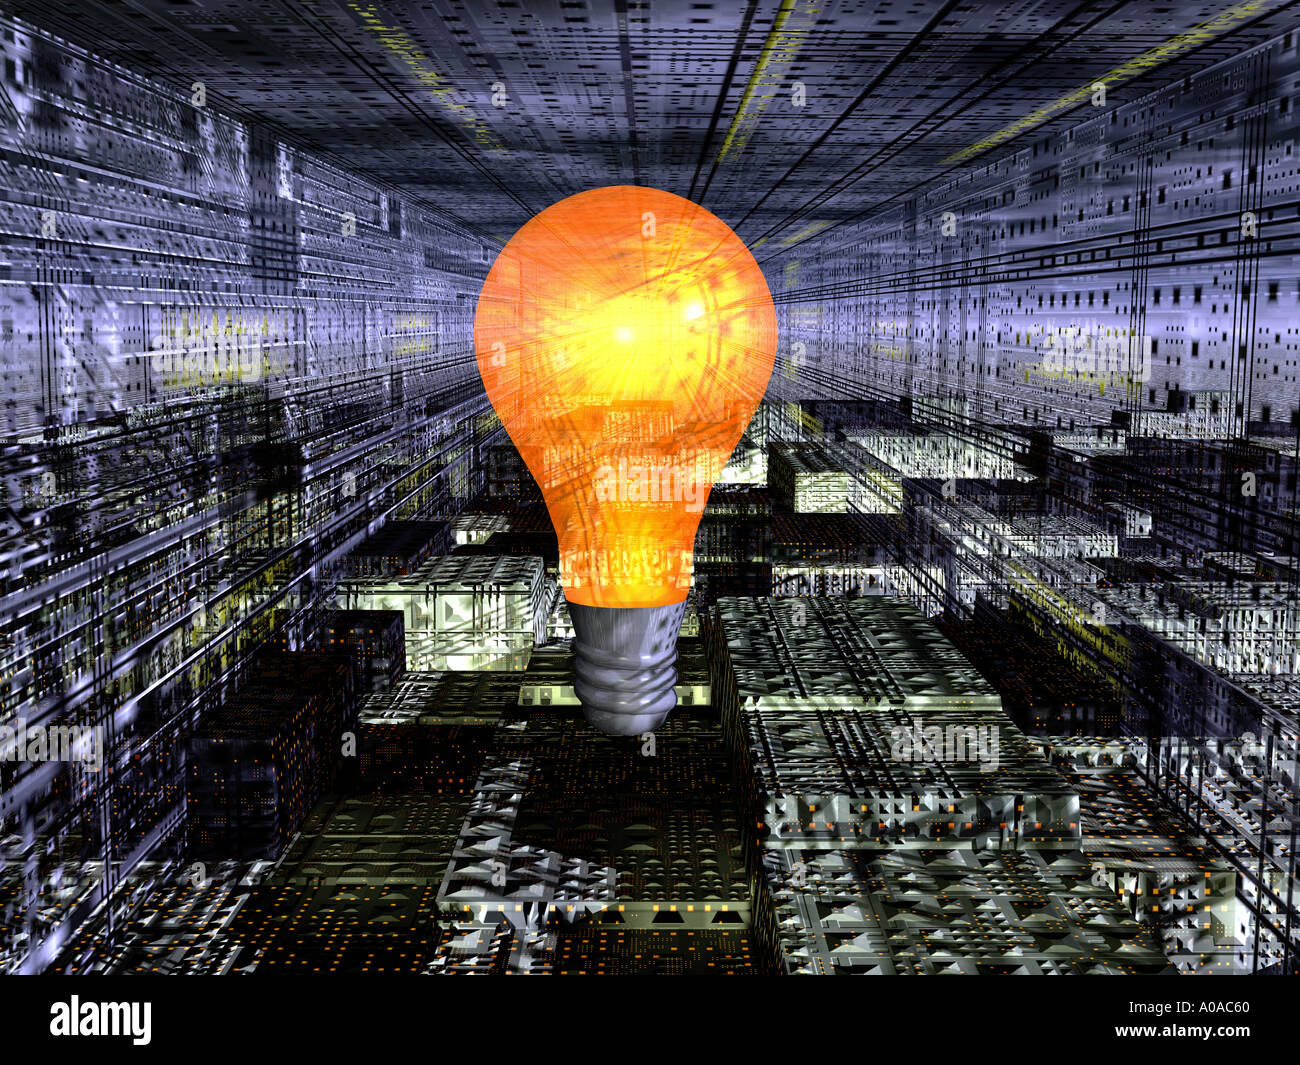 light bulb in industrial sci fi setting - Stock Image